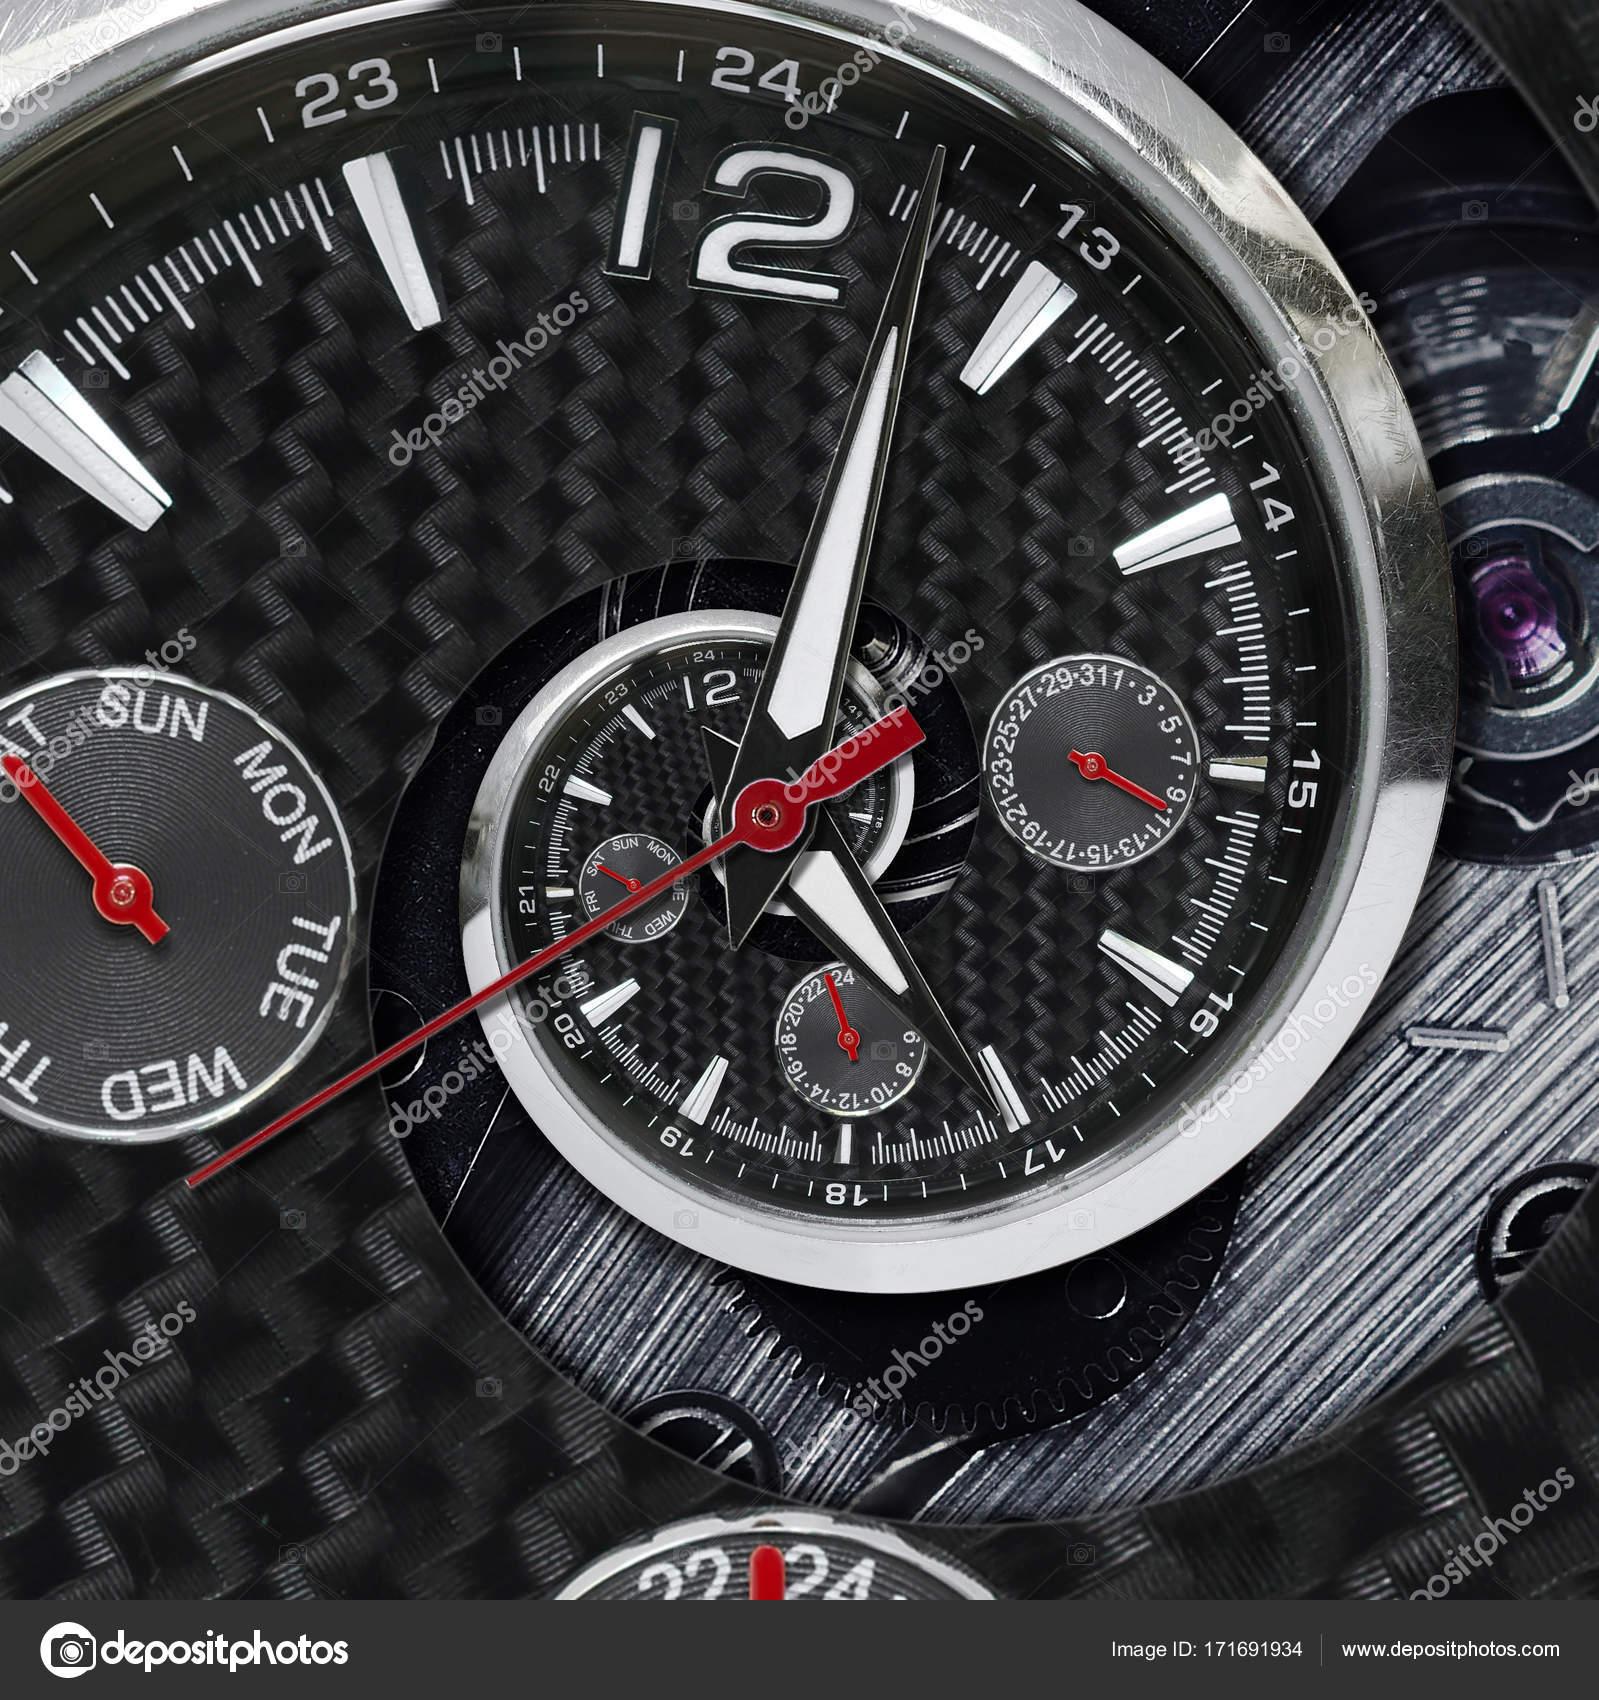 uhr modern affordable bild with uhr modern herren uhr nautica naig uhr uhren armbanduhr watch. Black Bedroom Furniture Sets. Home Design Ideas